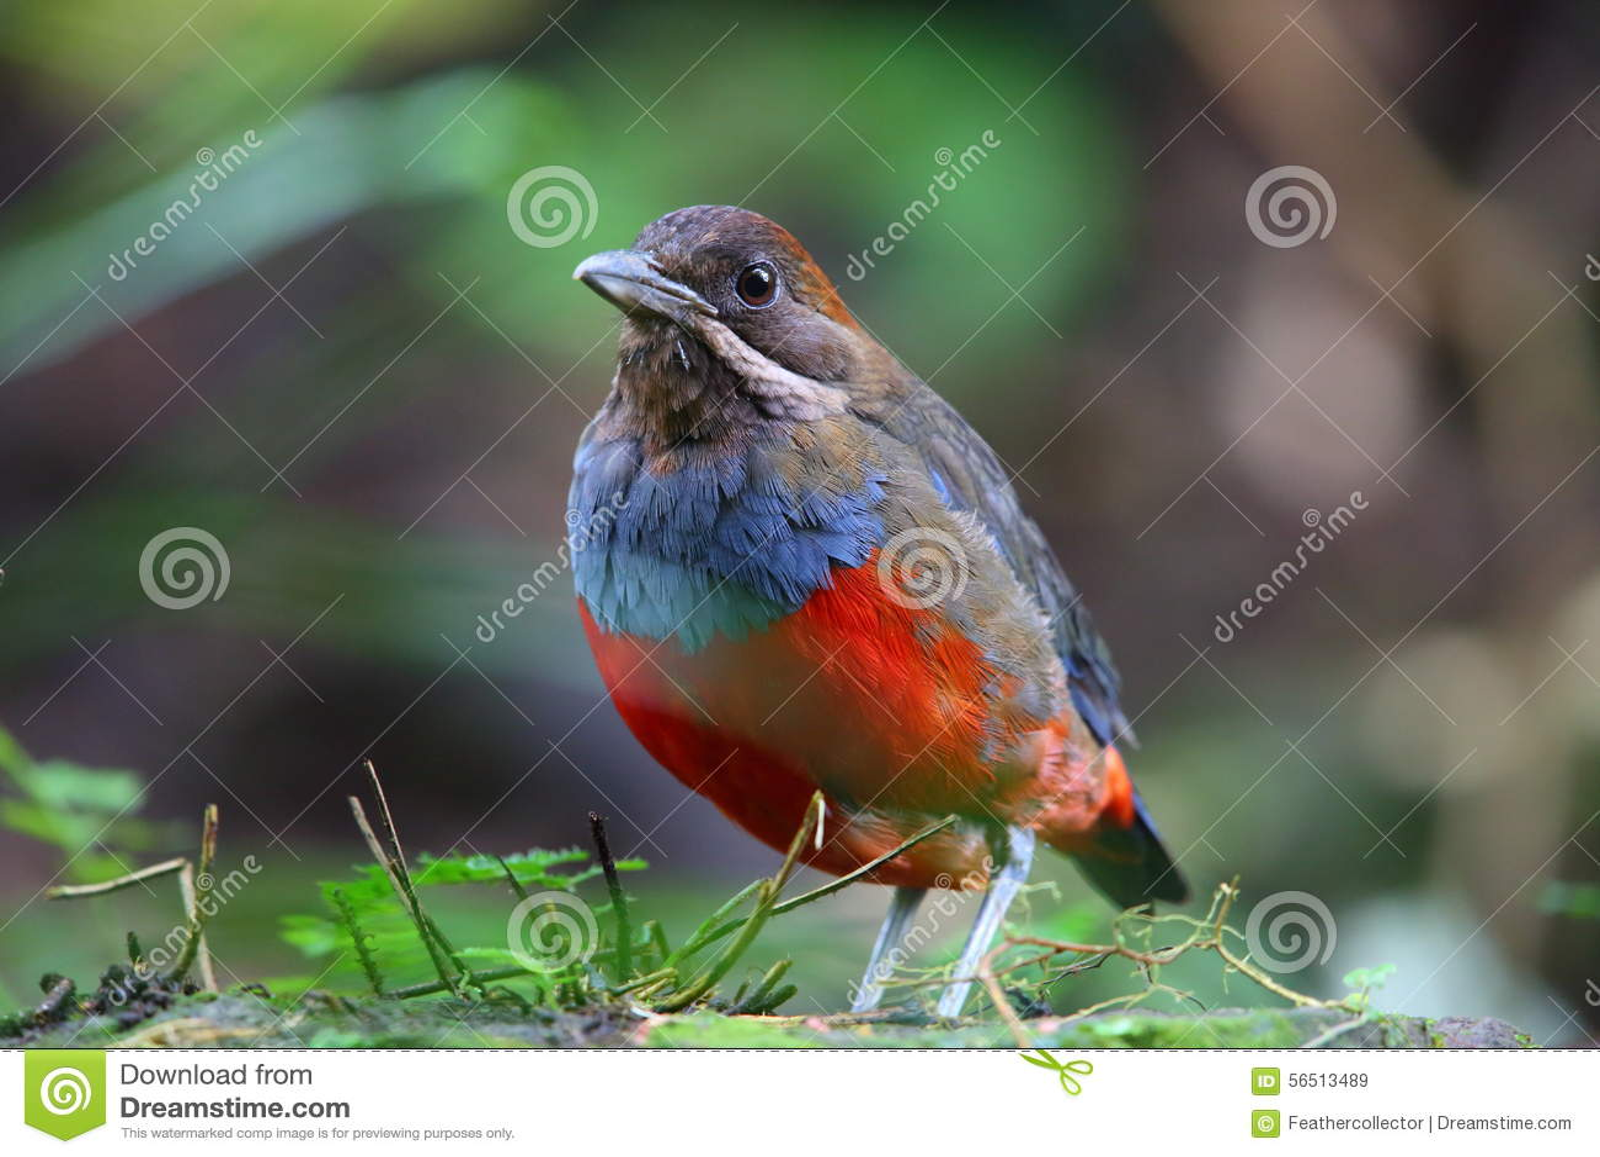 Download Whiskered Pitta stock image. Image of natural, animal - 56513489